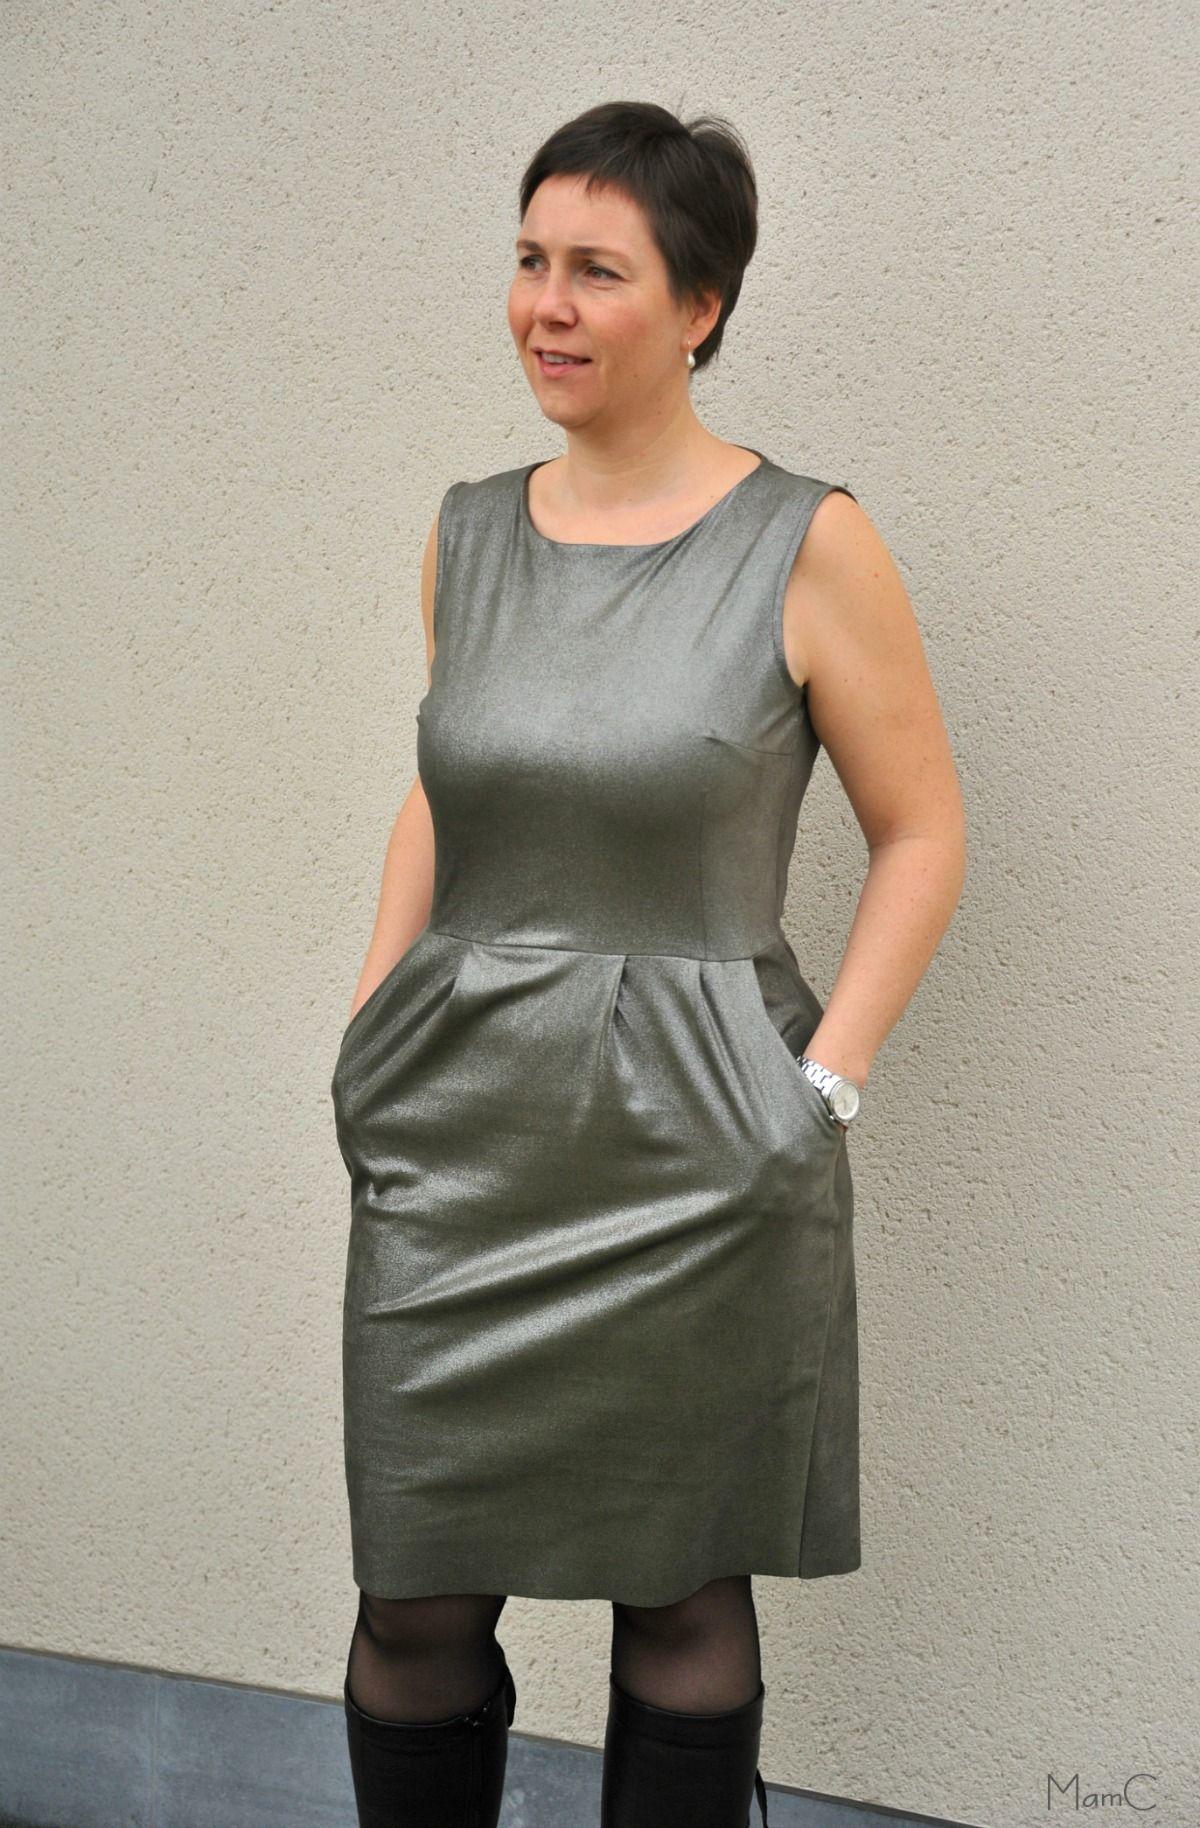 For Lora Jurk Lmv FeesteditieNaaiwerkjes Work Dresses – yPm8Nnwv0O